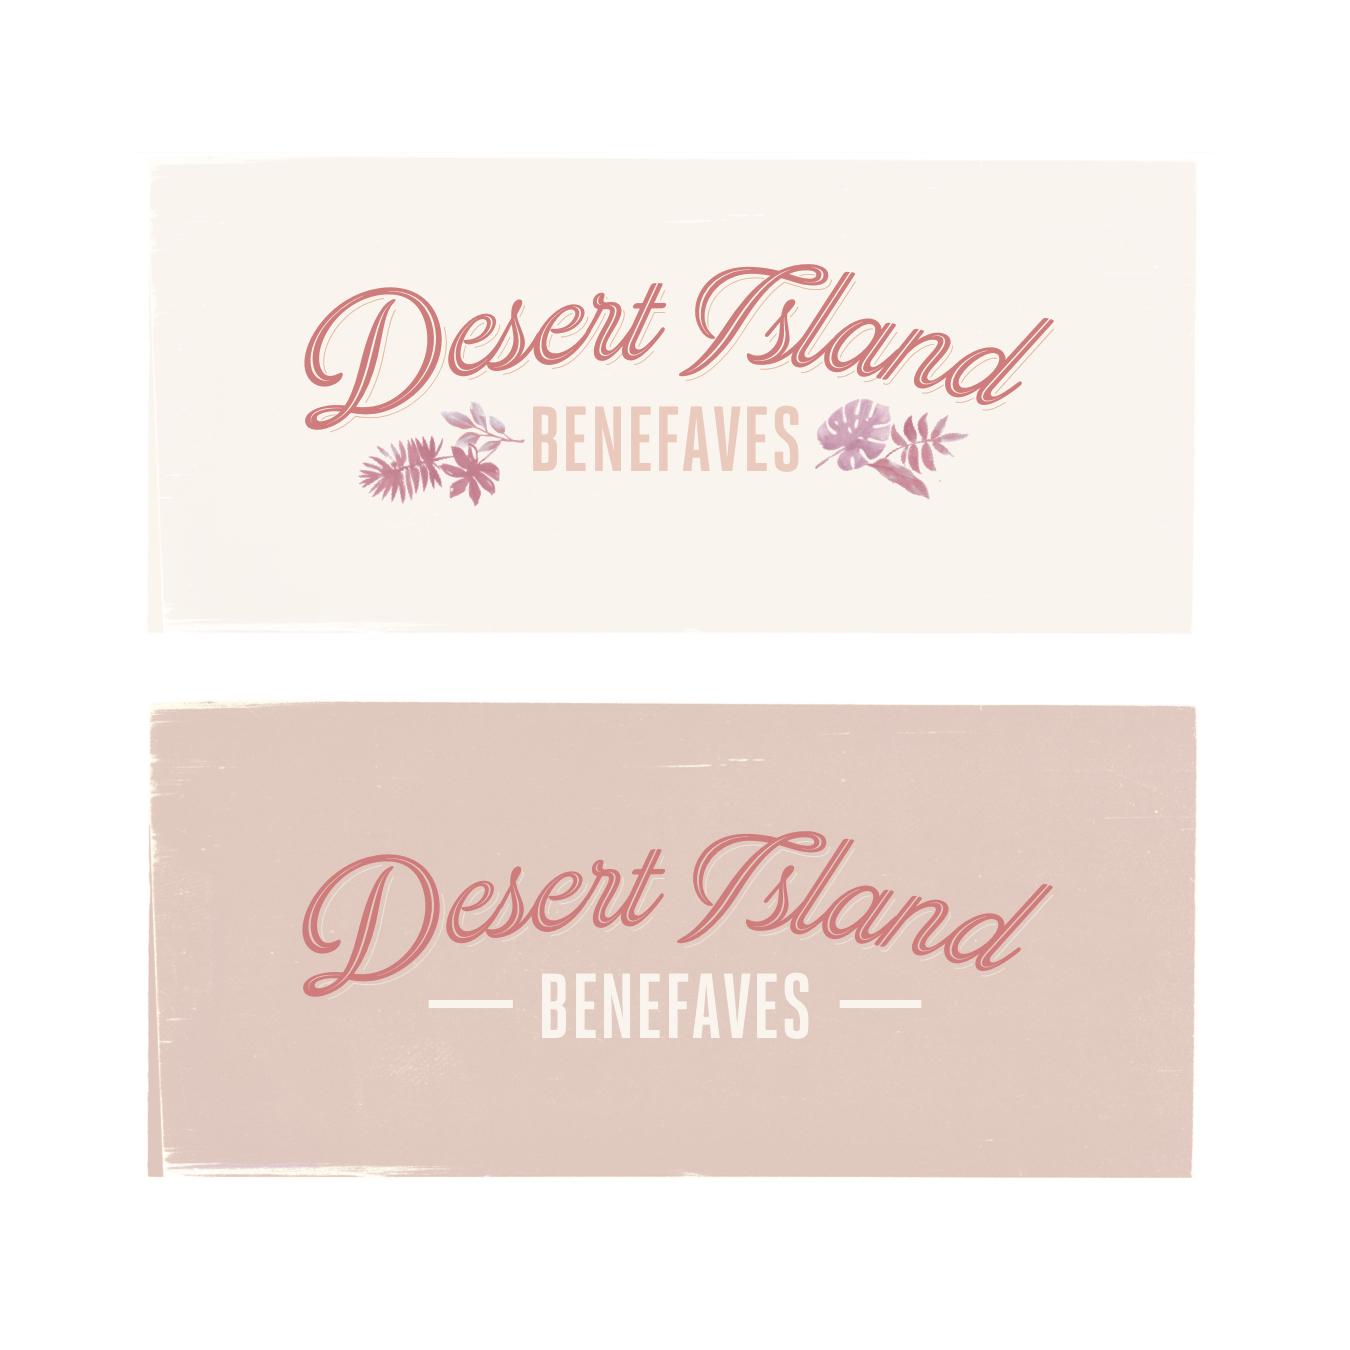 desert-island-sketches_05-03-17_p8.jpg